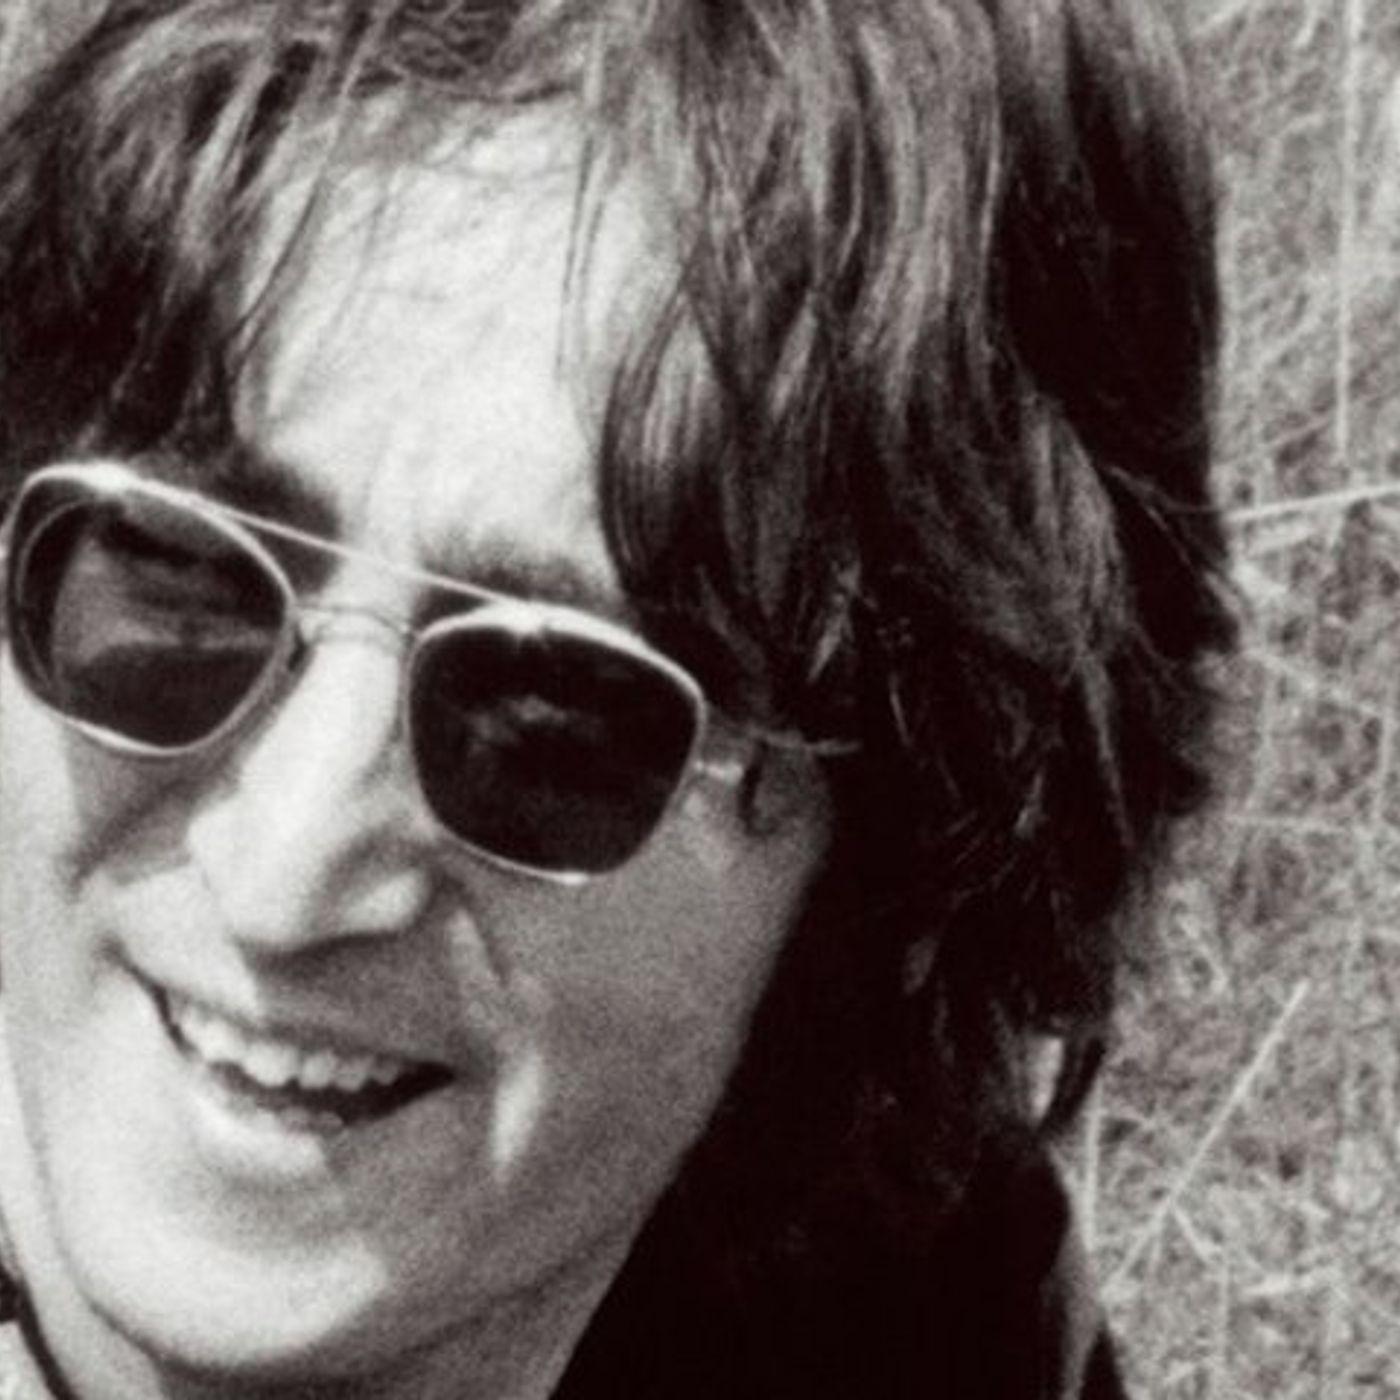 Classicos do Rock o Podcast #1345 #johnlennon #semanaLennon #Lennon81 #GnFnR #avengers #whatif #scream #wearamask #thebatman #eternals